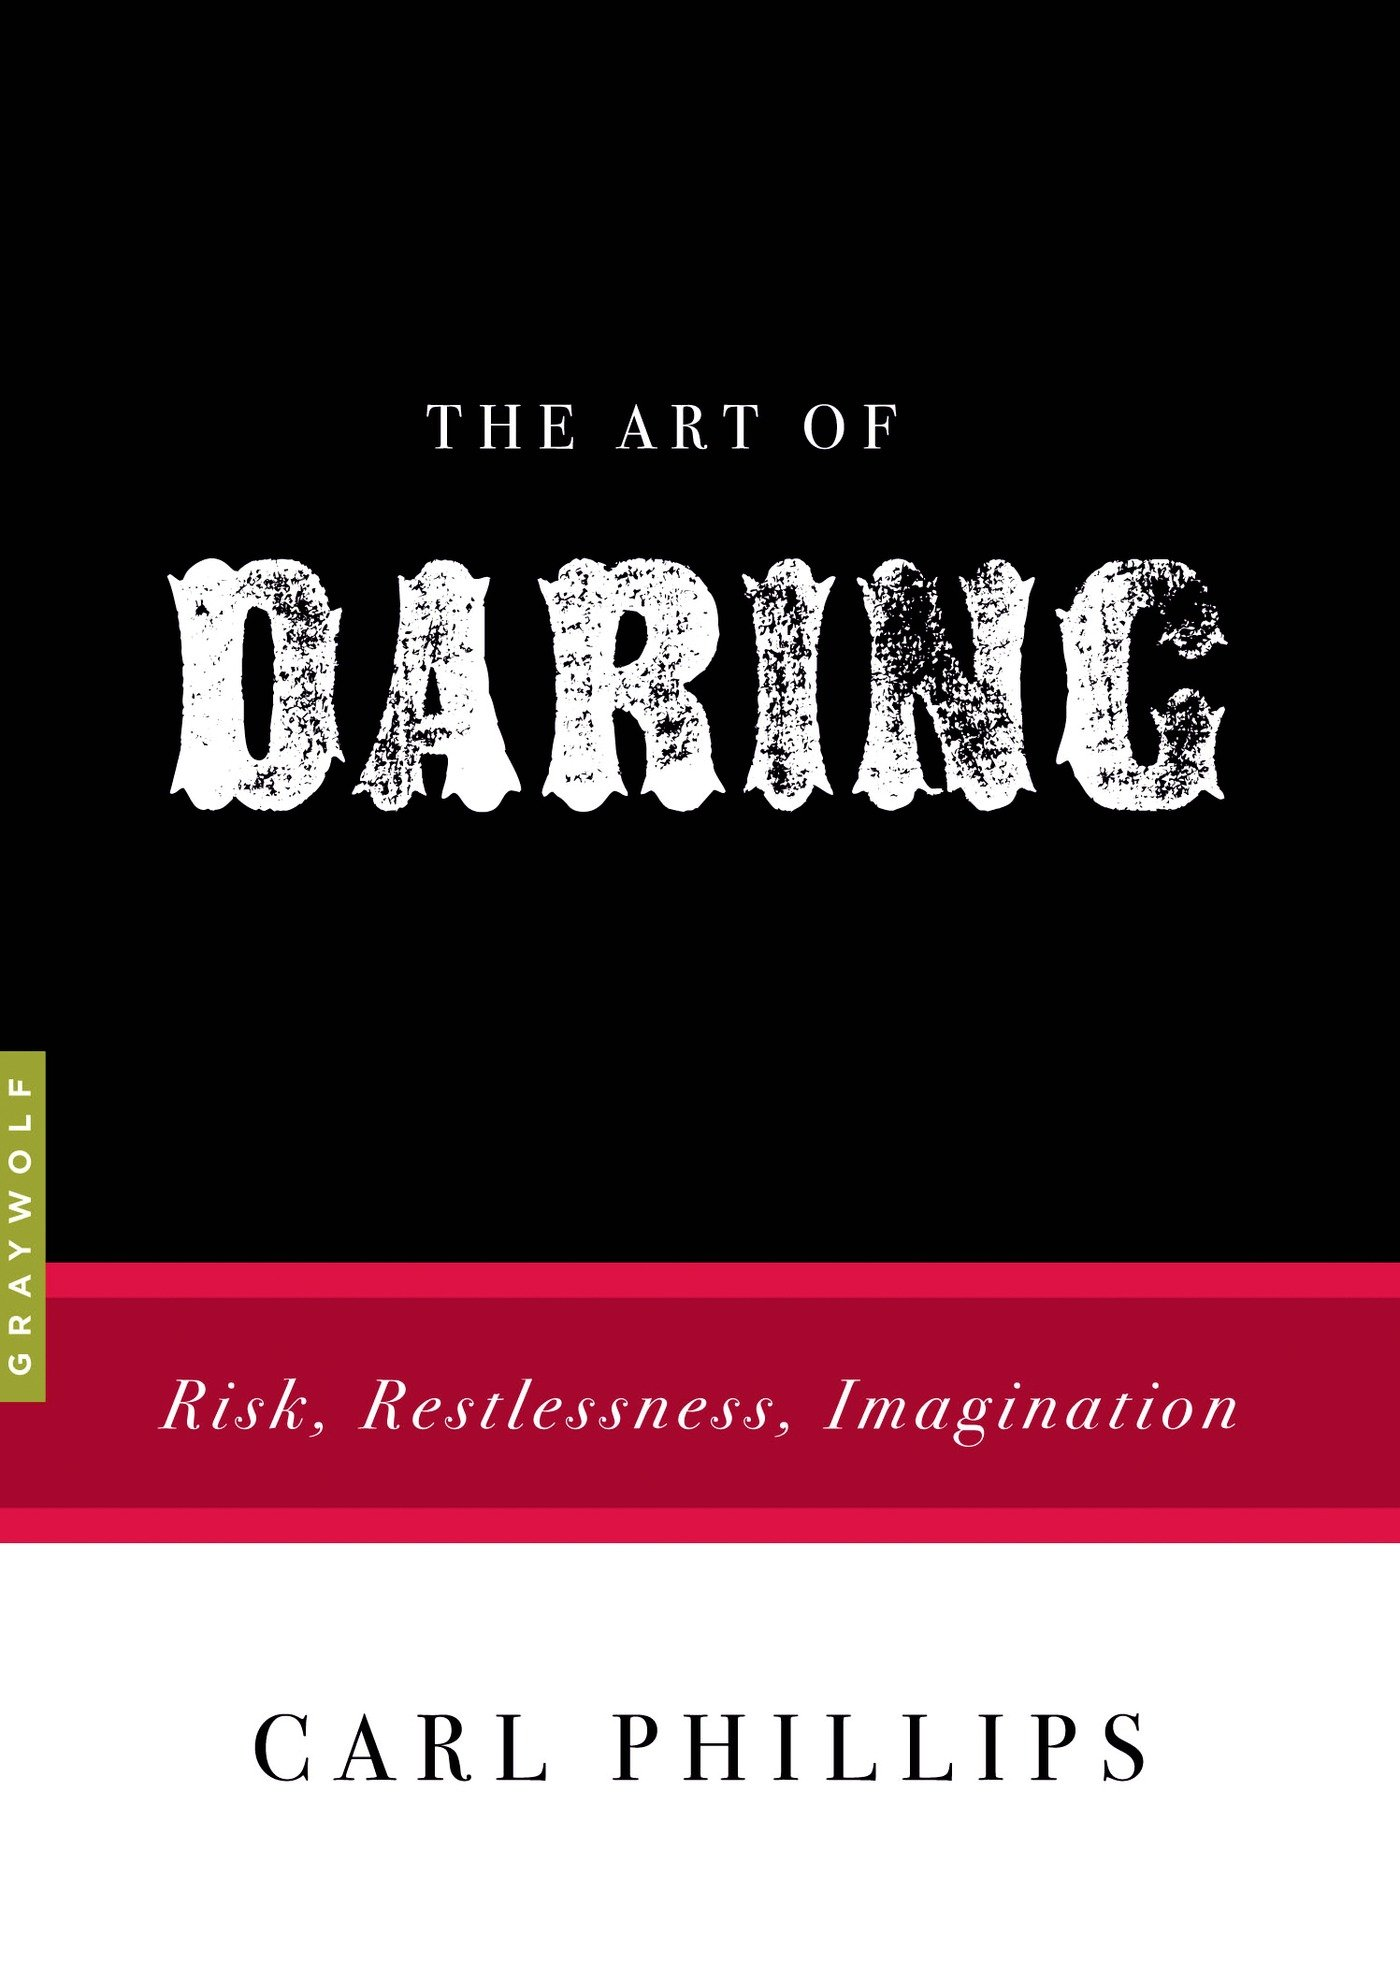 The Art of Daring: Risk, Restlessness, Imagination PDF